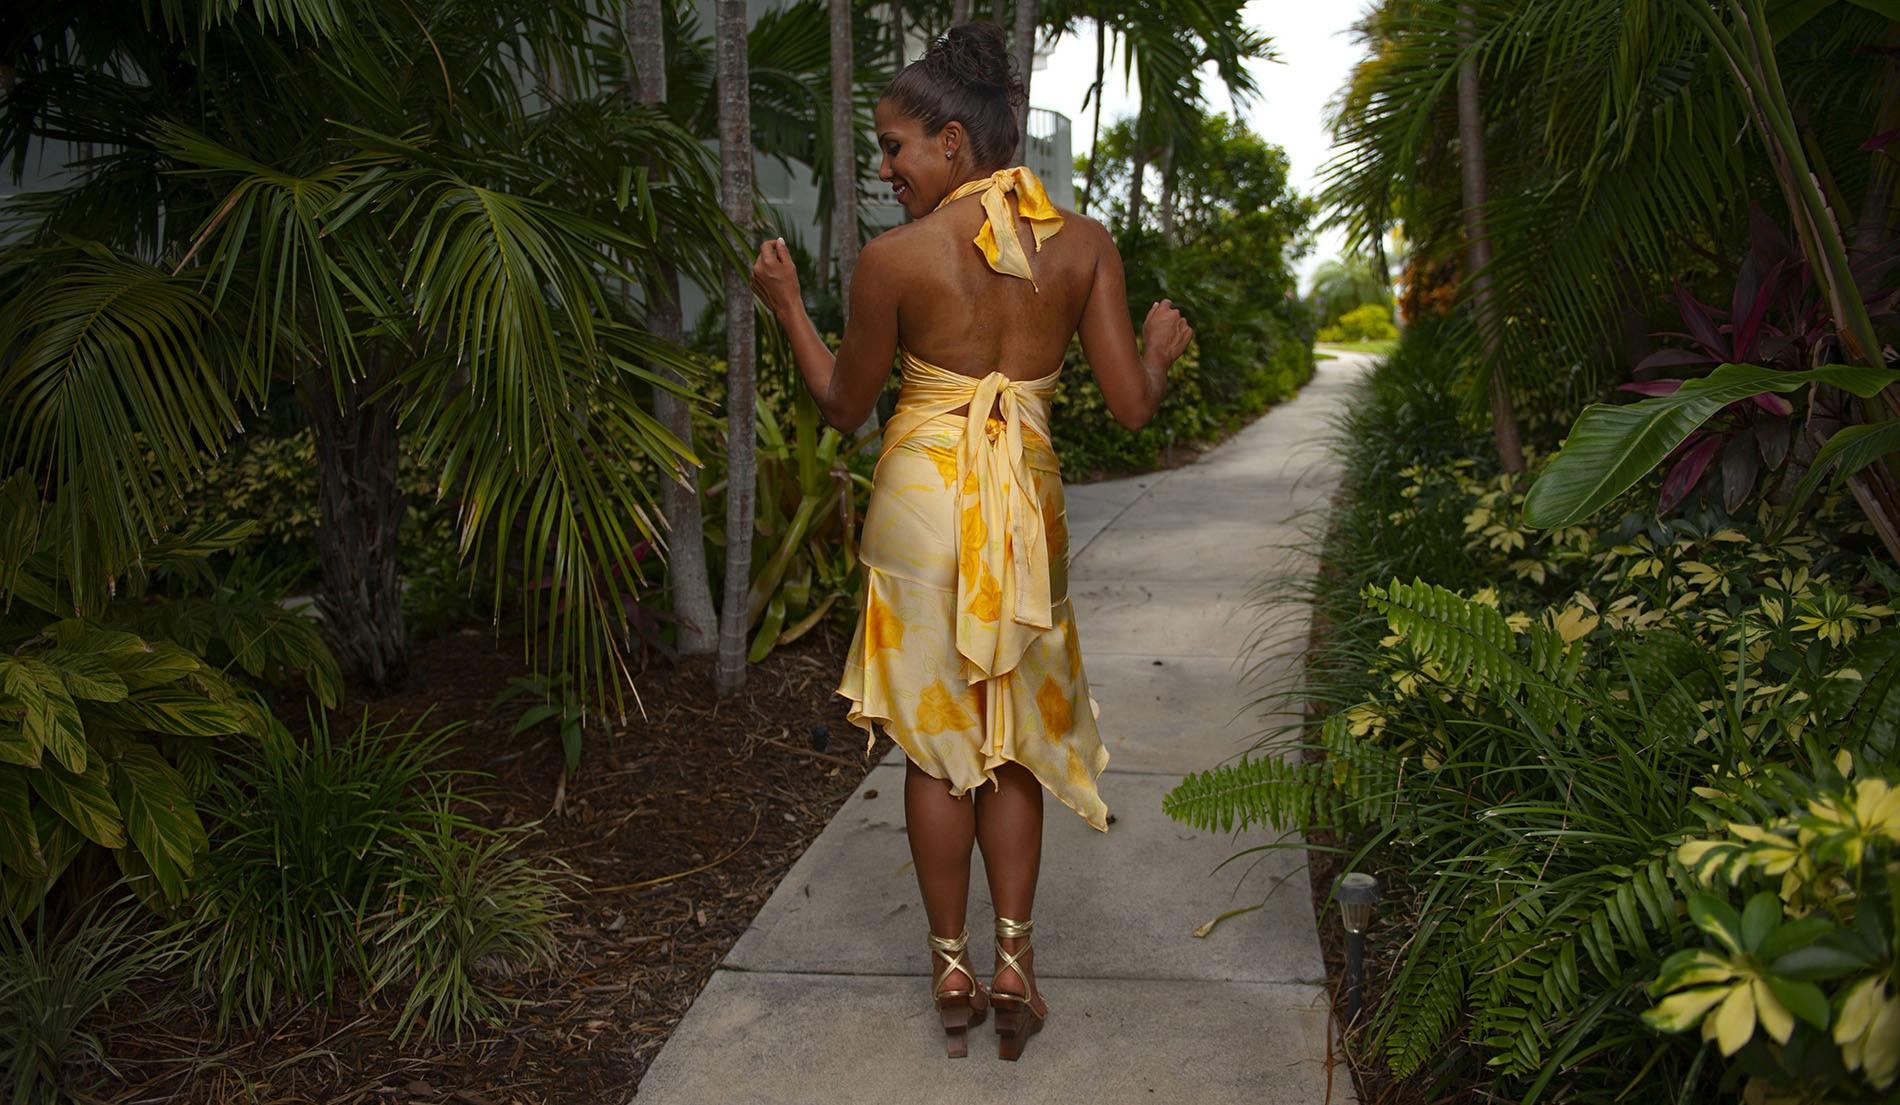 Swrrtheart Halter Handkerchief Hemline Bridesmaid Destination Skirt Ensemble - Puerto Rico - Look 3 back